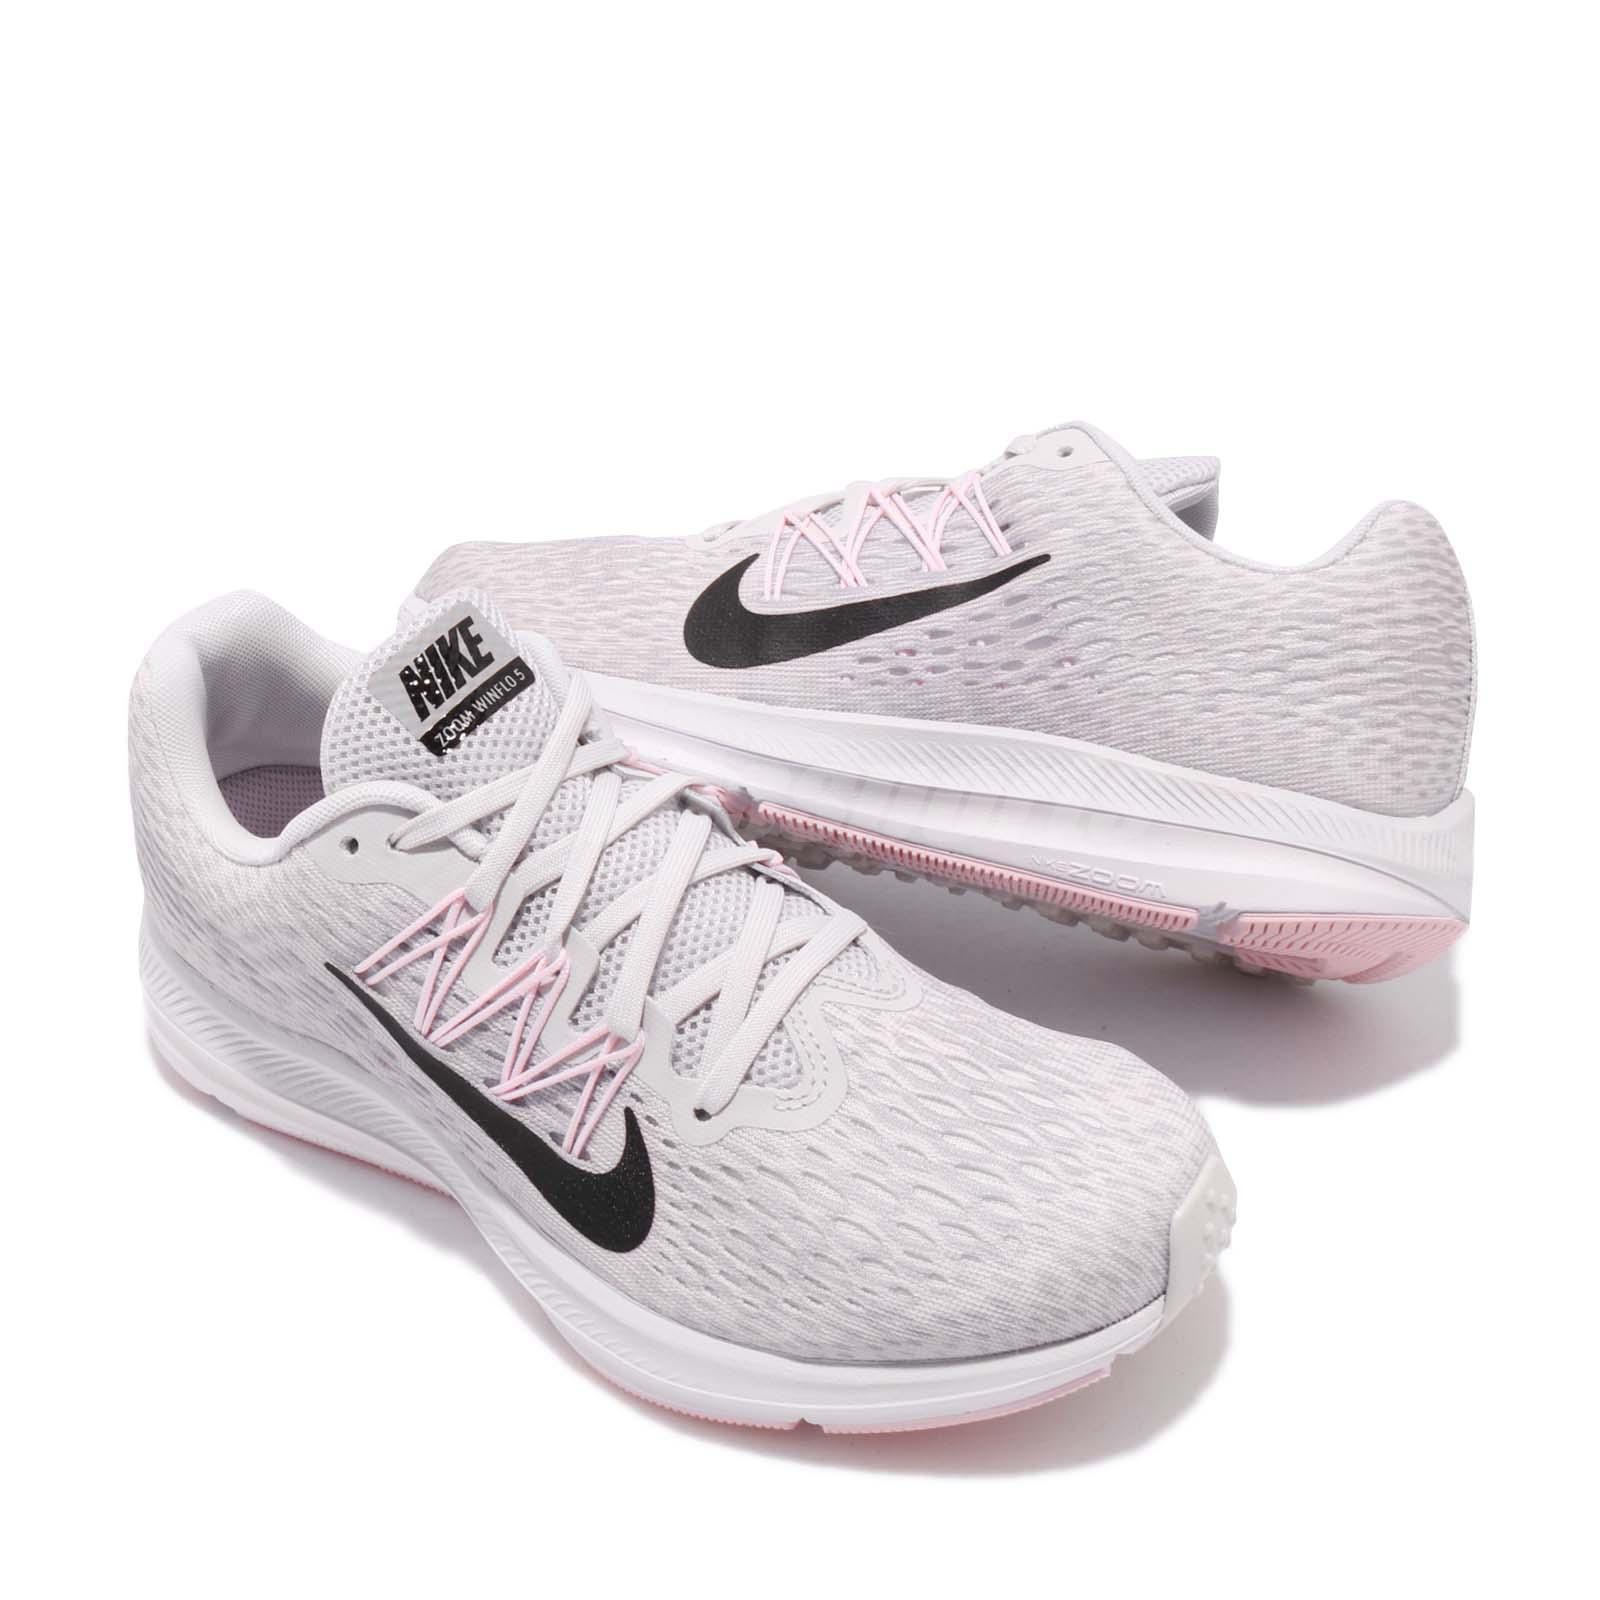 Nike Wmns Zoom Winflo 5 Grey Black Pink Womens Running ...